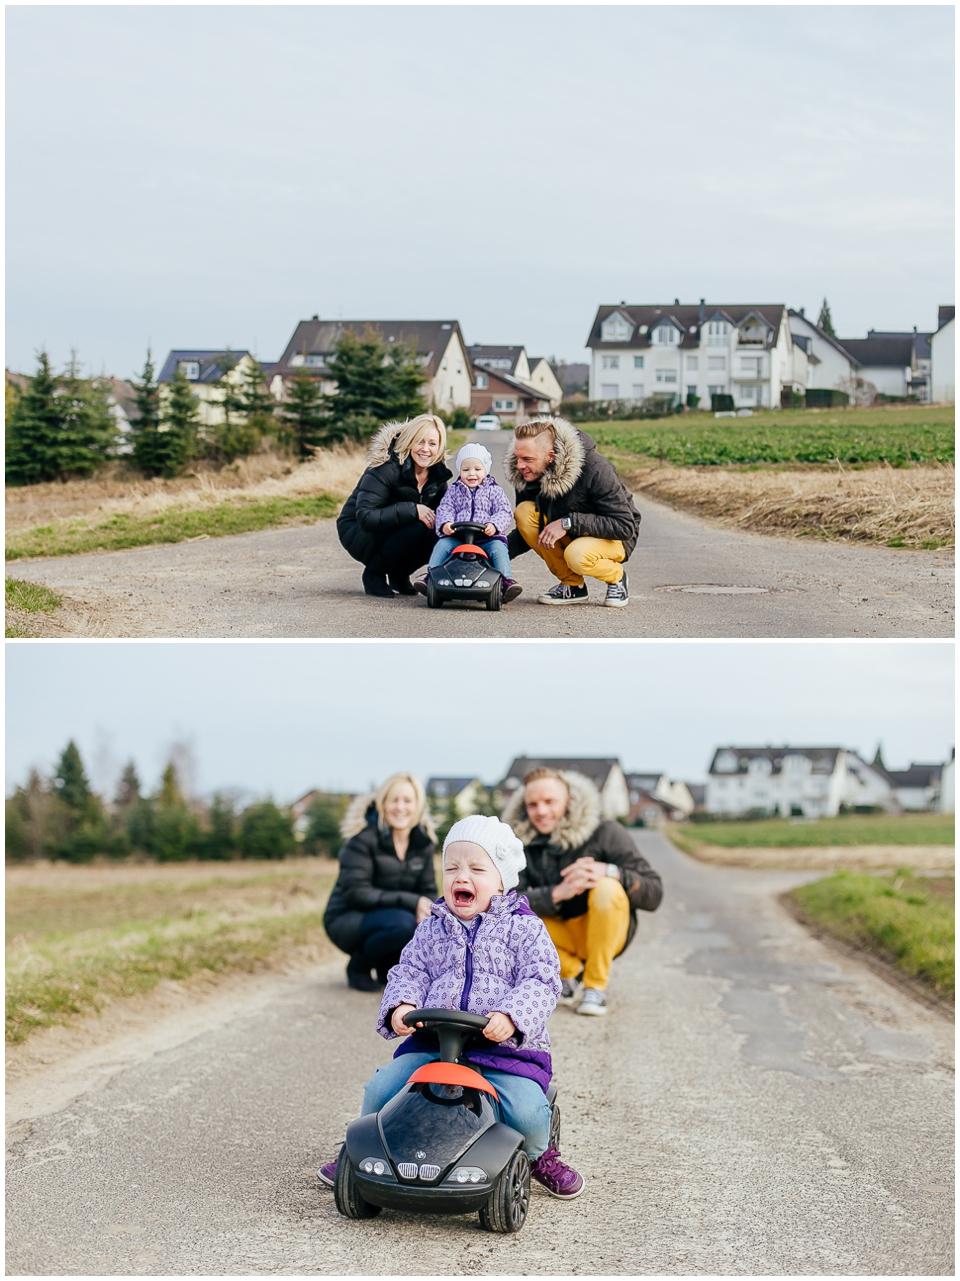 Familienshooting JB - Nicole Wahl Fotografie - Bonn_0035